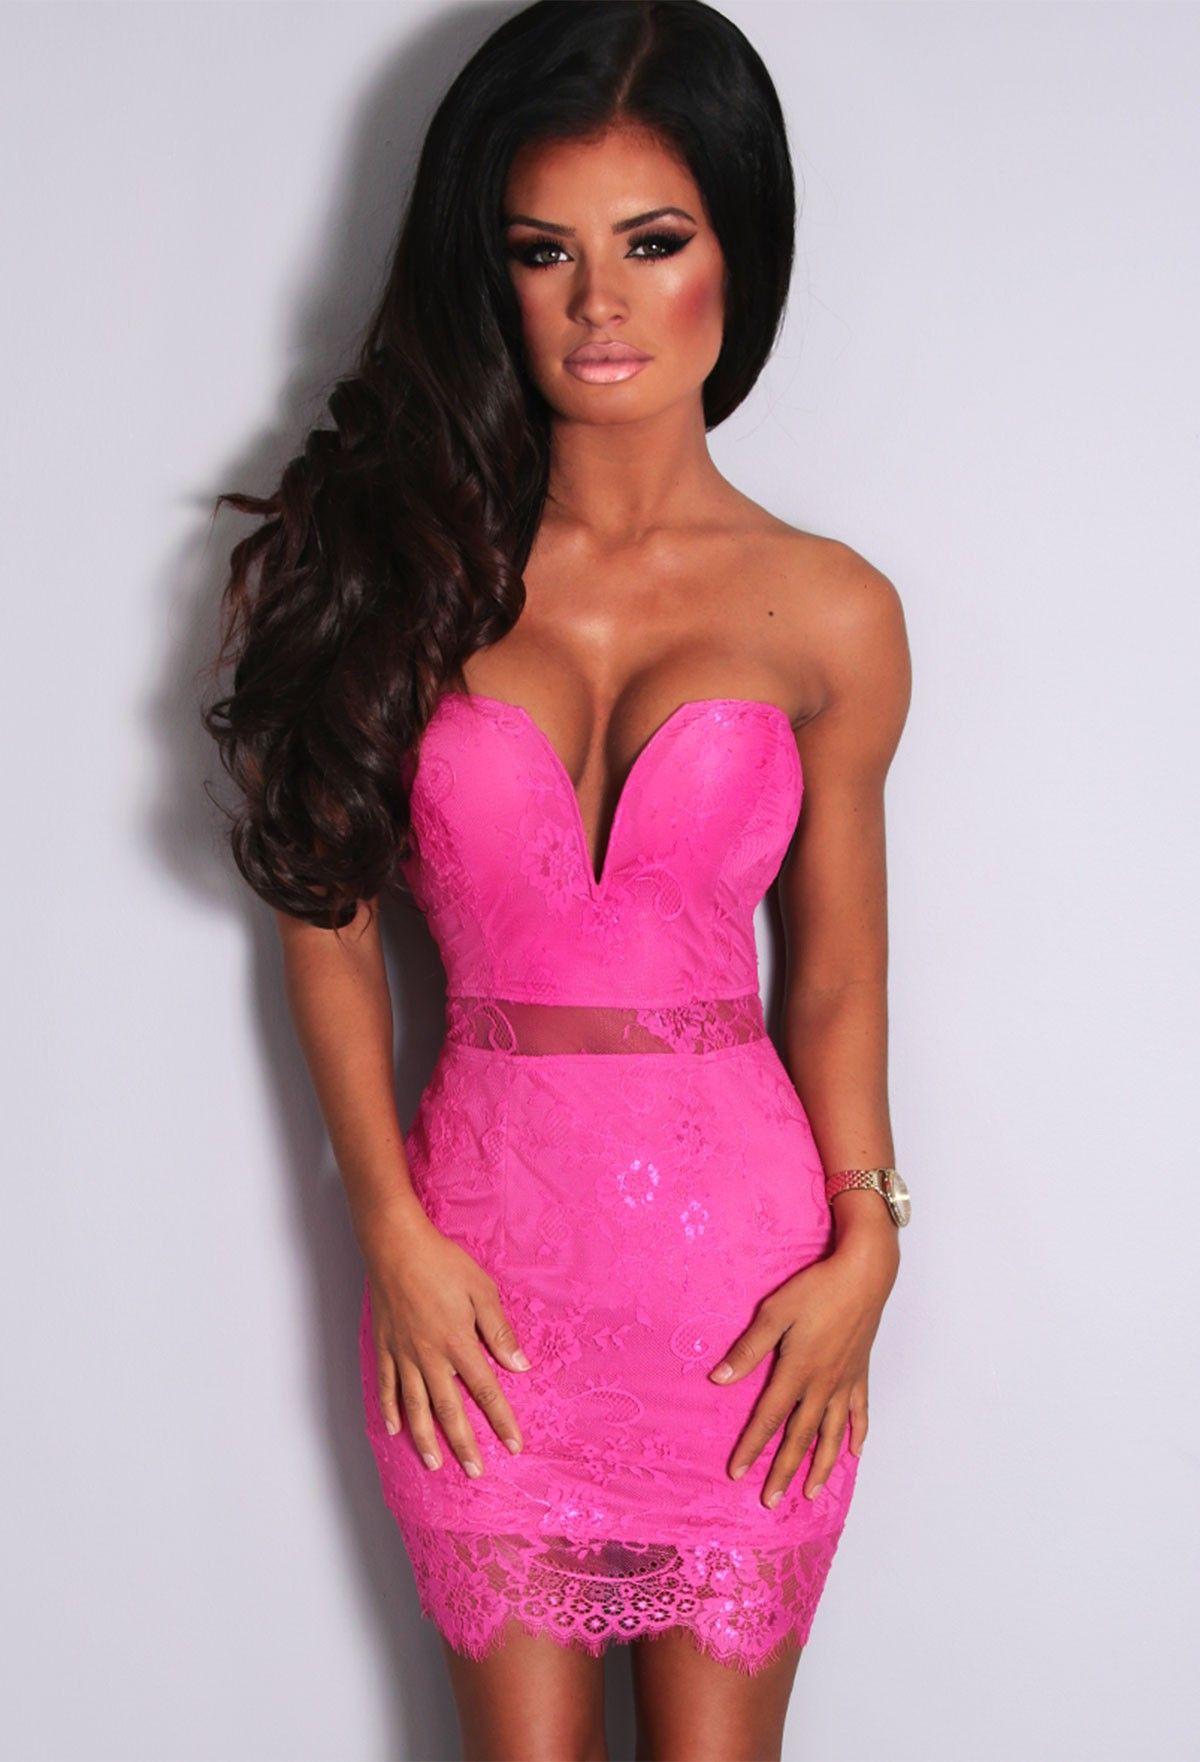 83ad2891b7ae6 Cici Hot Pink Lace Mini Dress - 6 | Fashion | Pink mini dresses ...